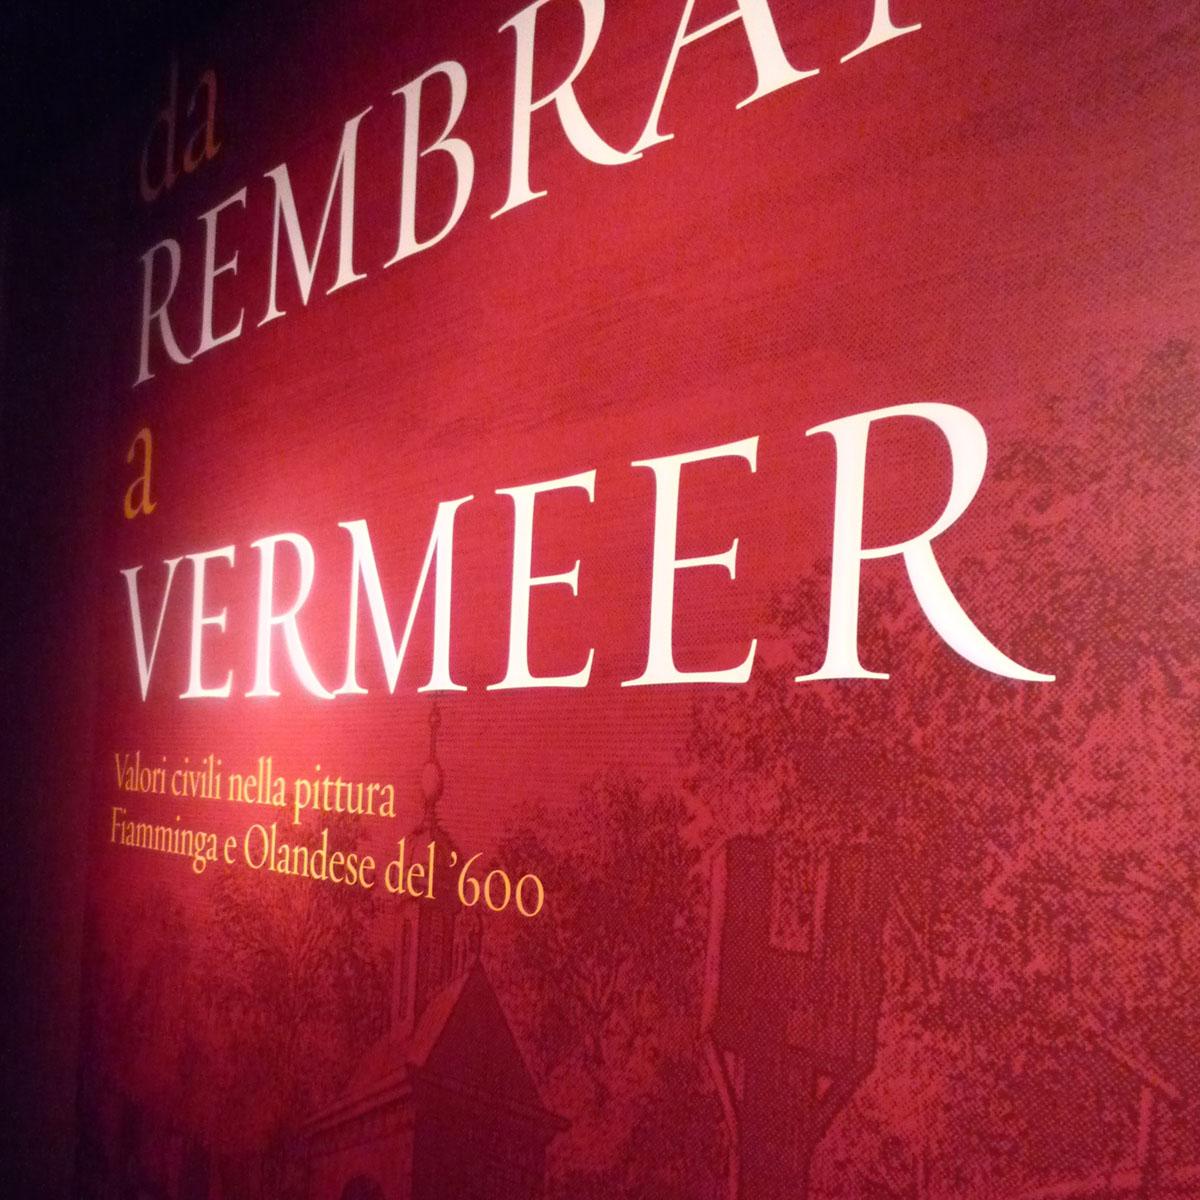 Da-Rembrandt-a-Vermeer-007